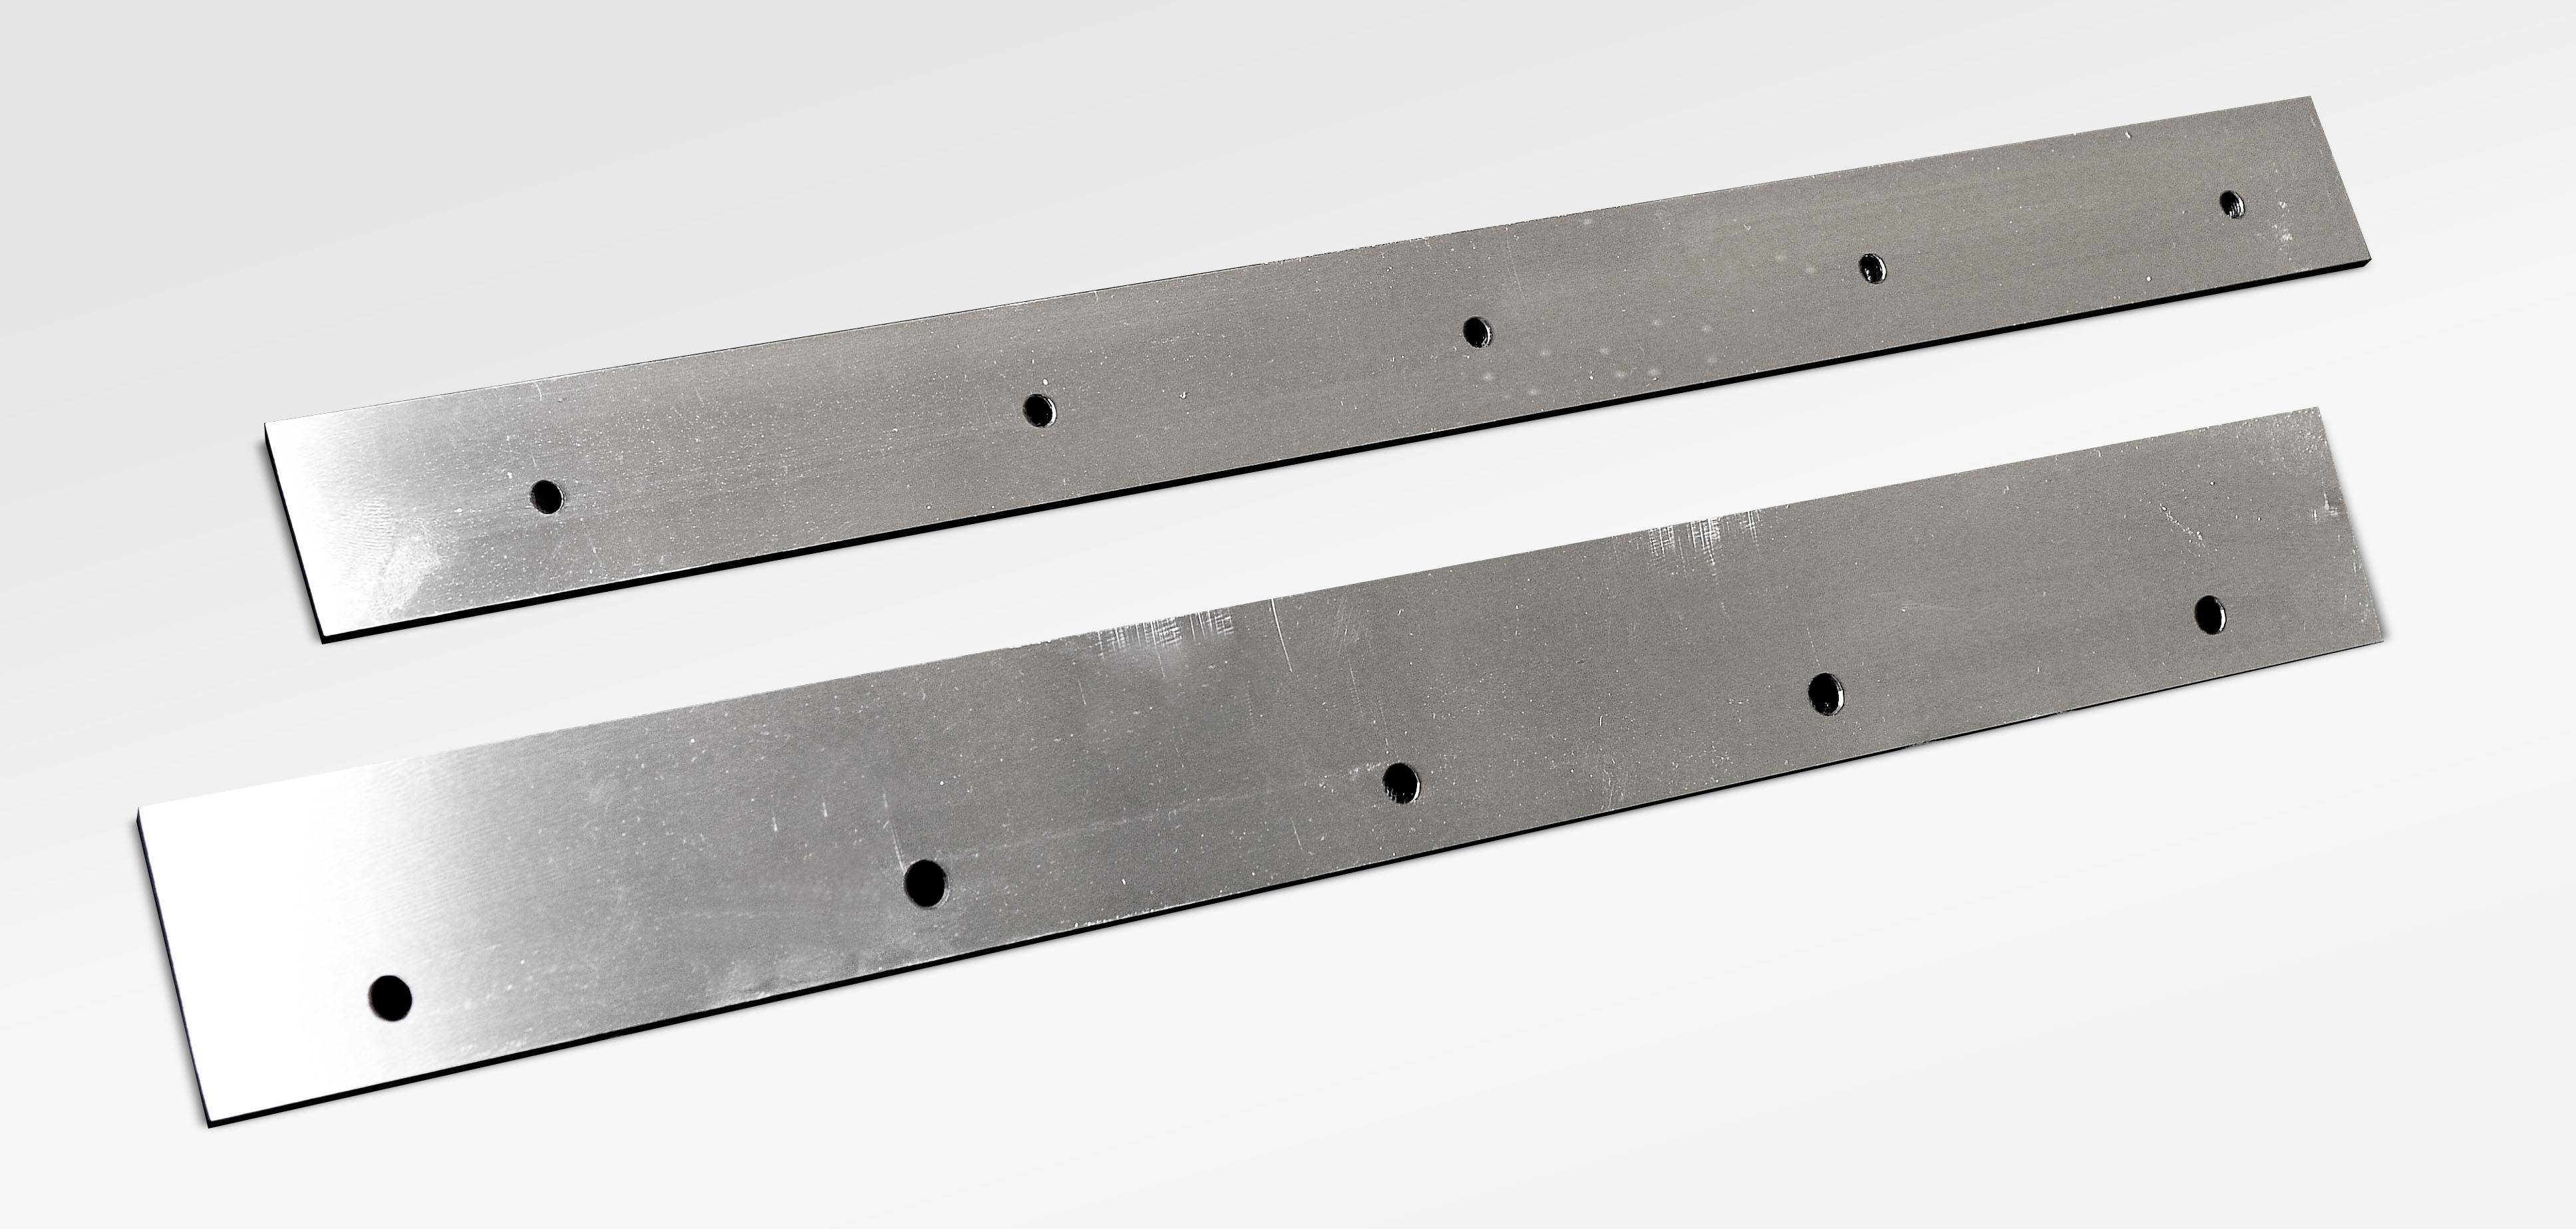 PCB Guillotine Shear Blades